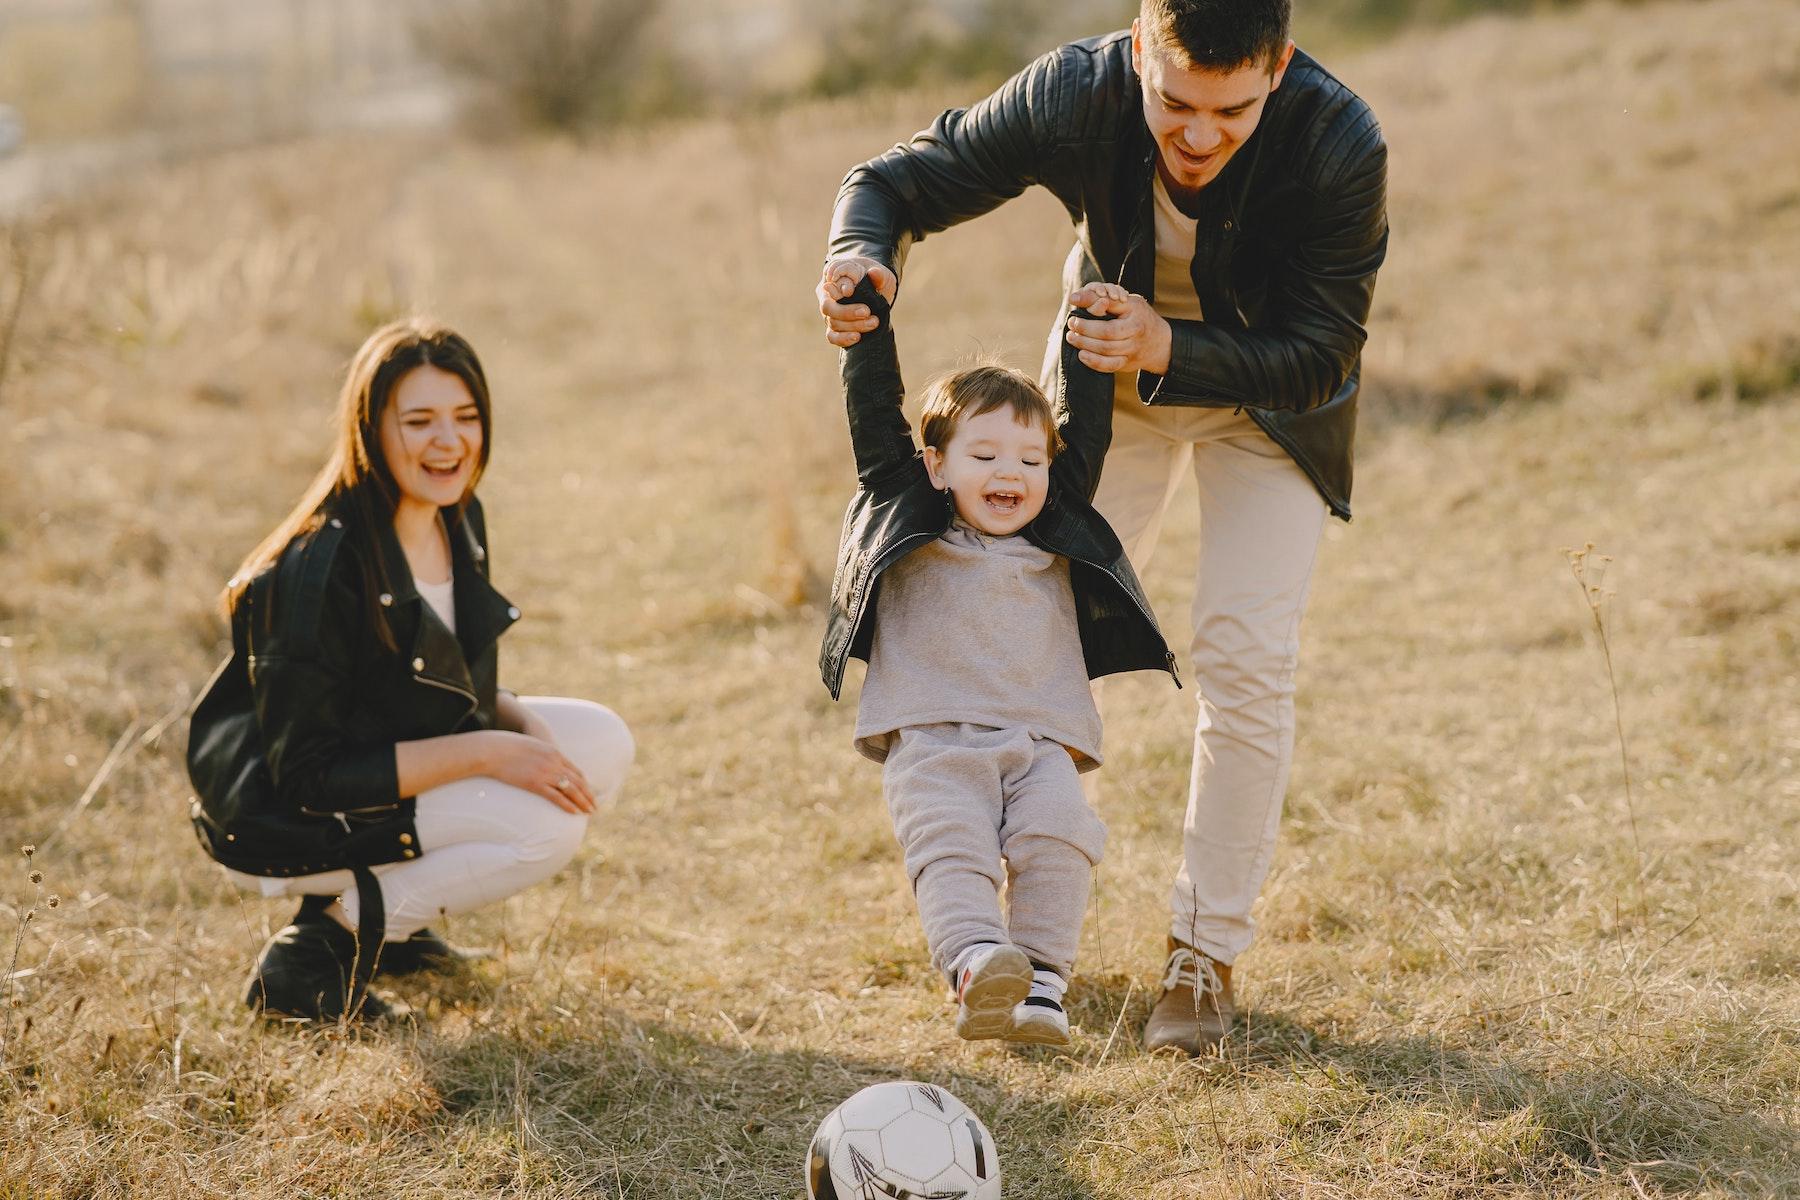 2021 Mental Health Goals for Every Parent   Parent Cue Blog